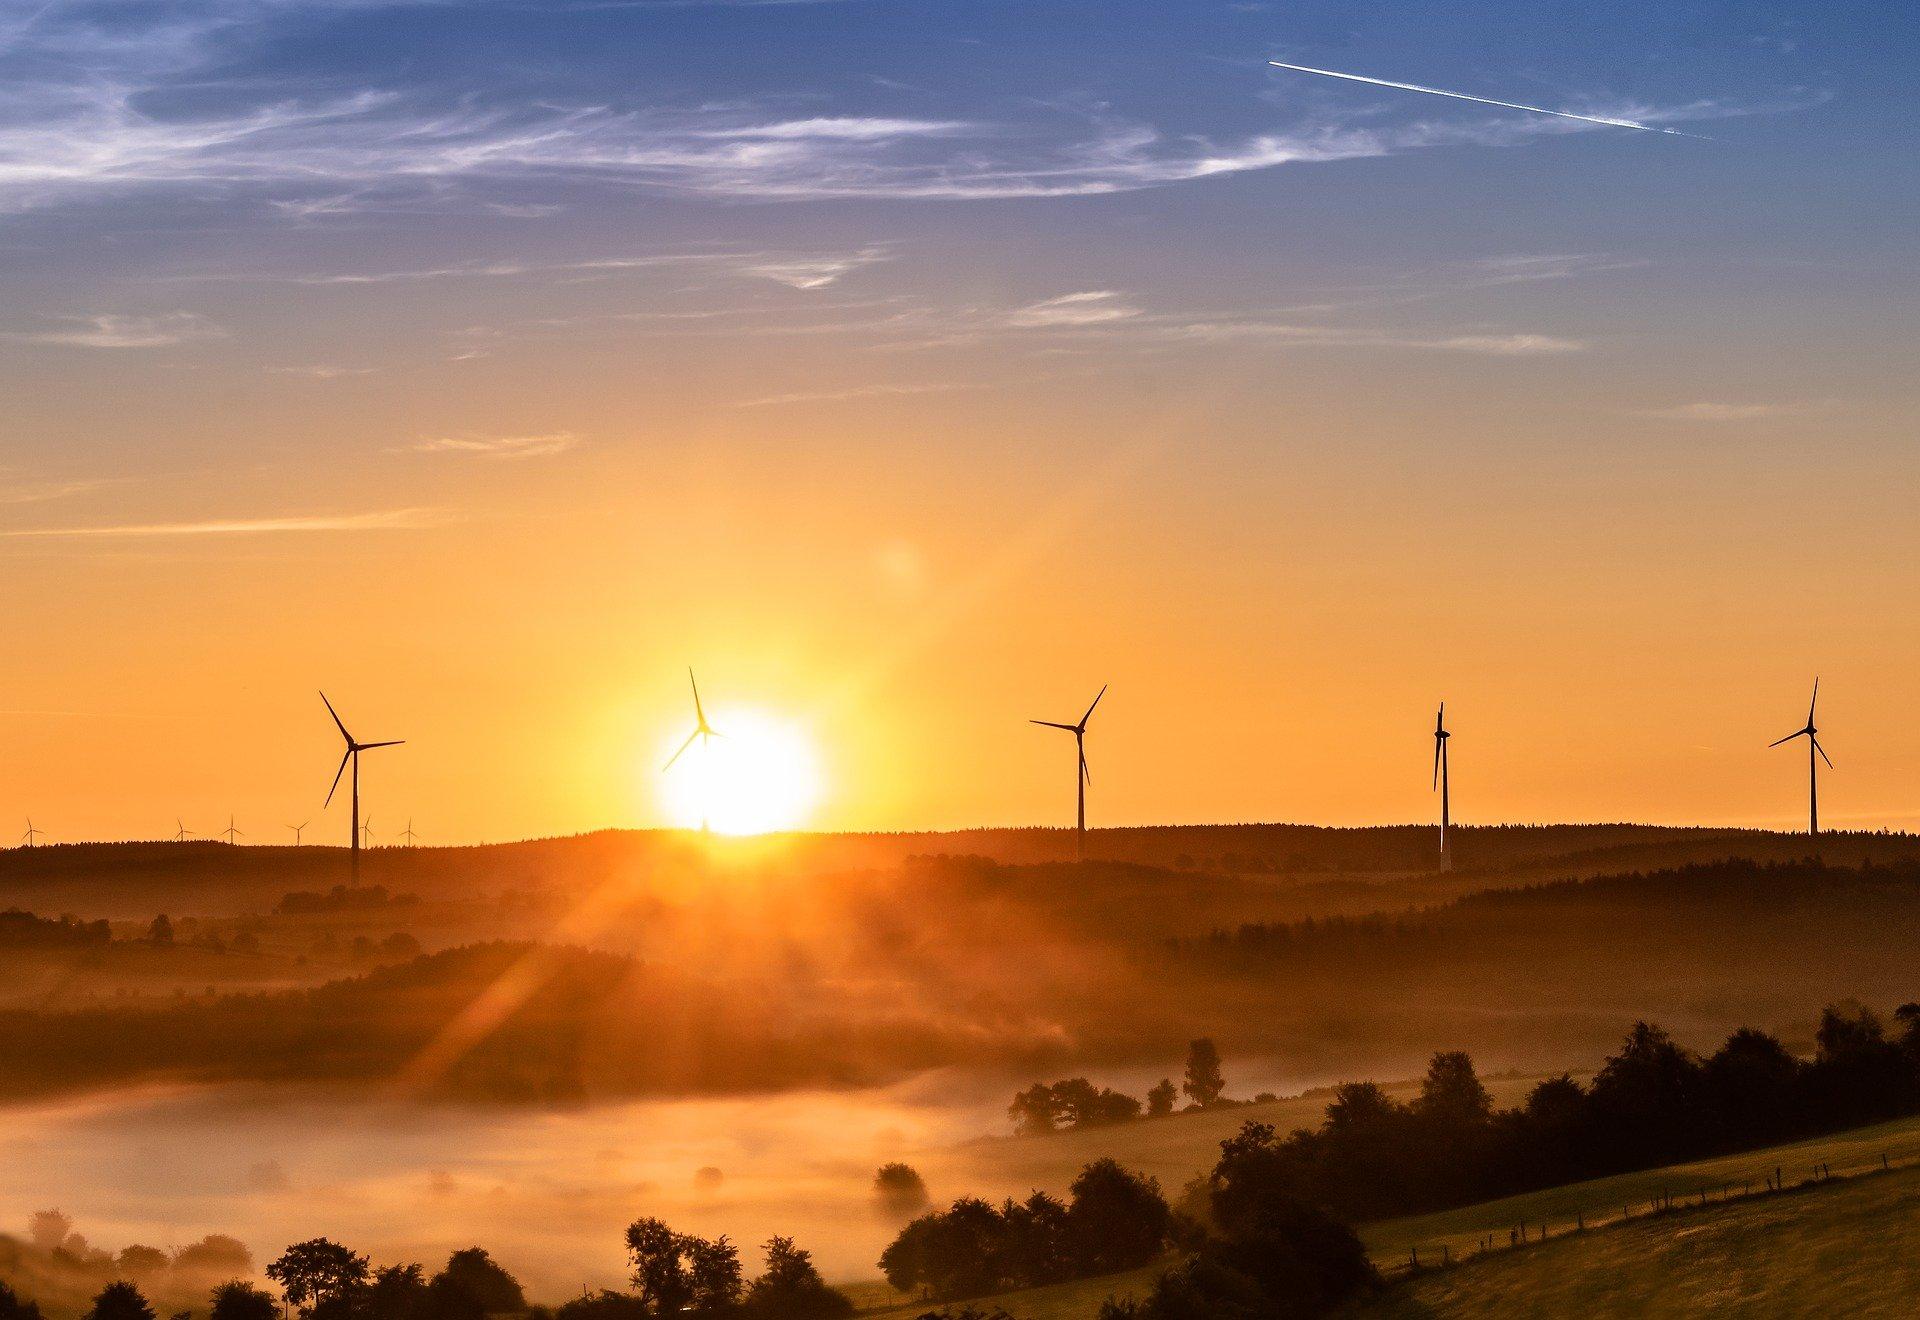 roche-sur-yon usine michelin pole energies durables - L'Energeek